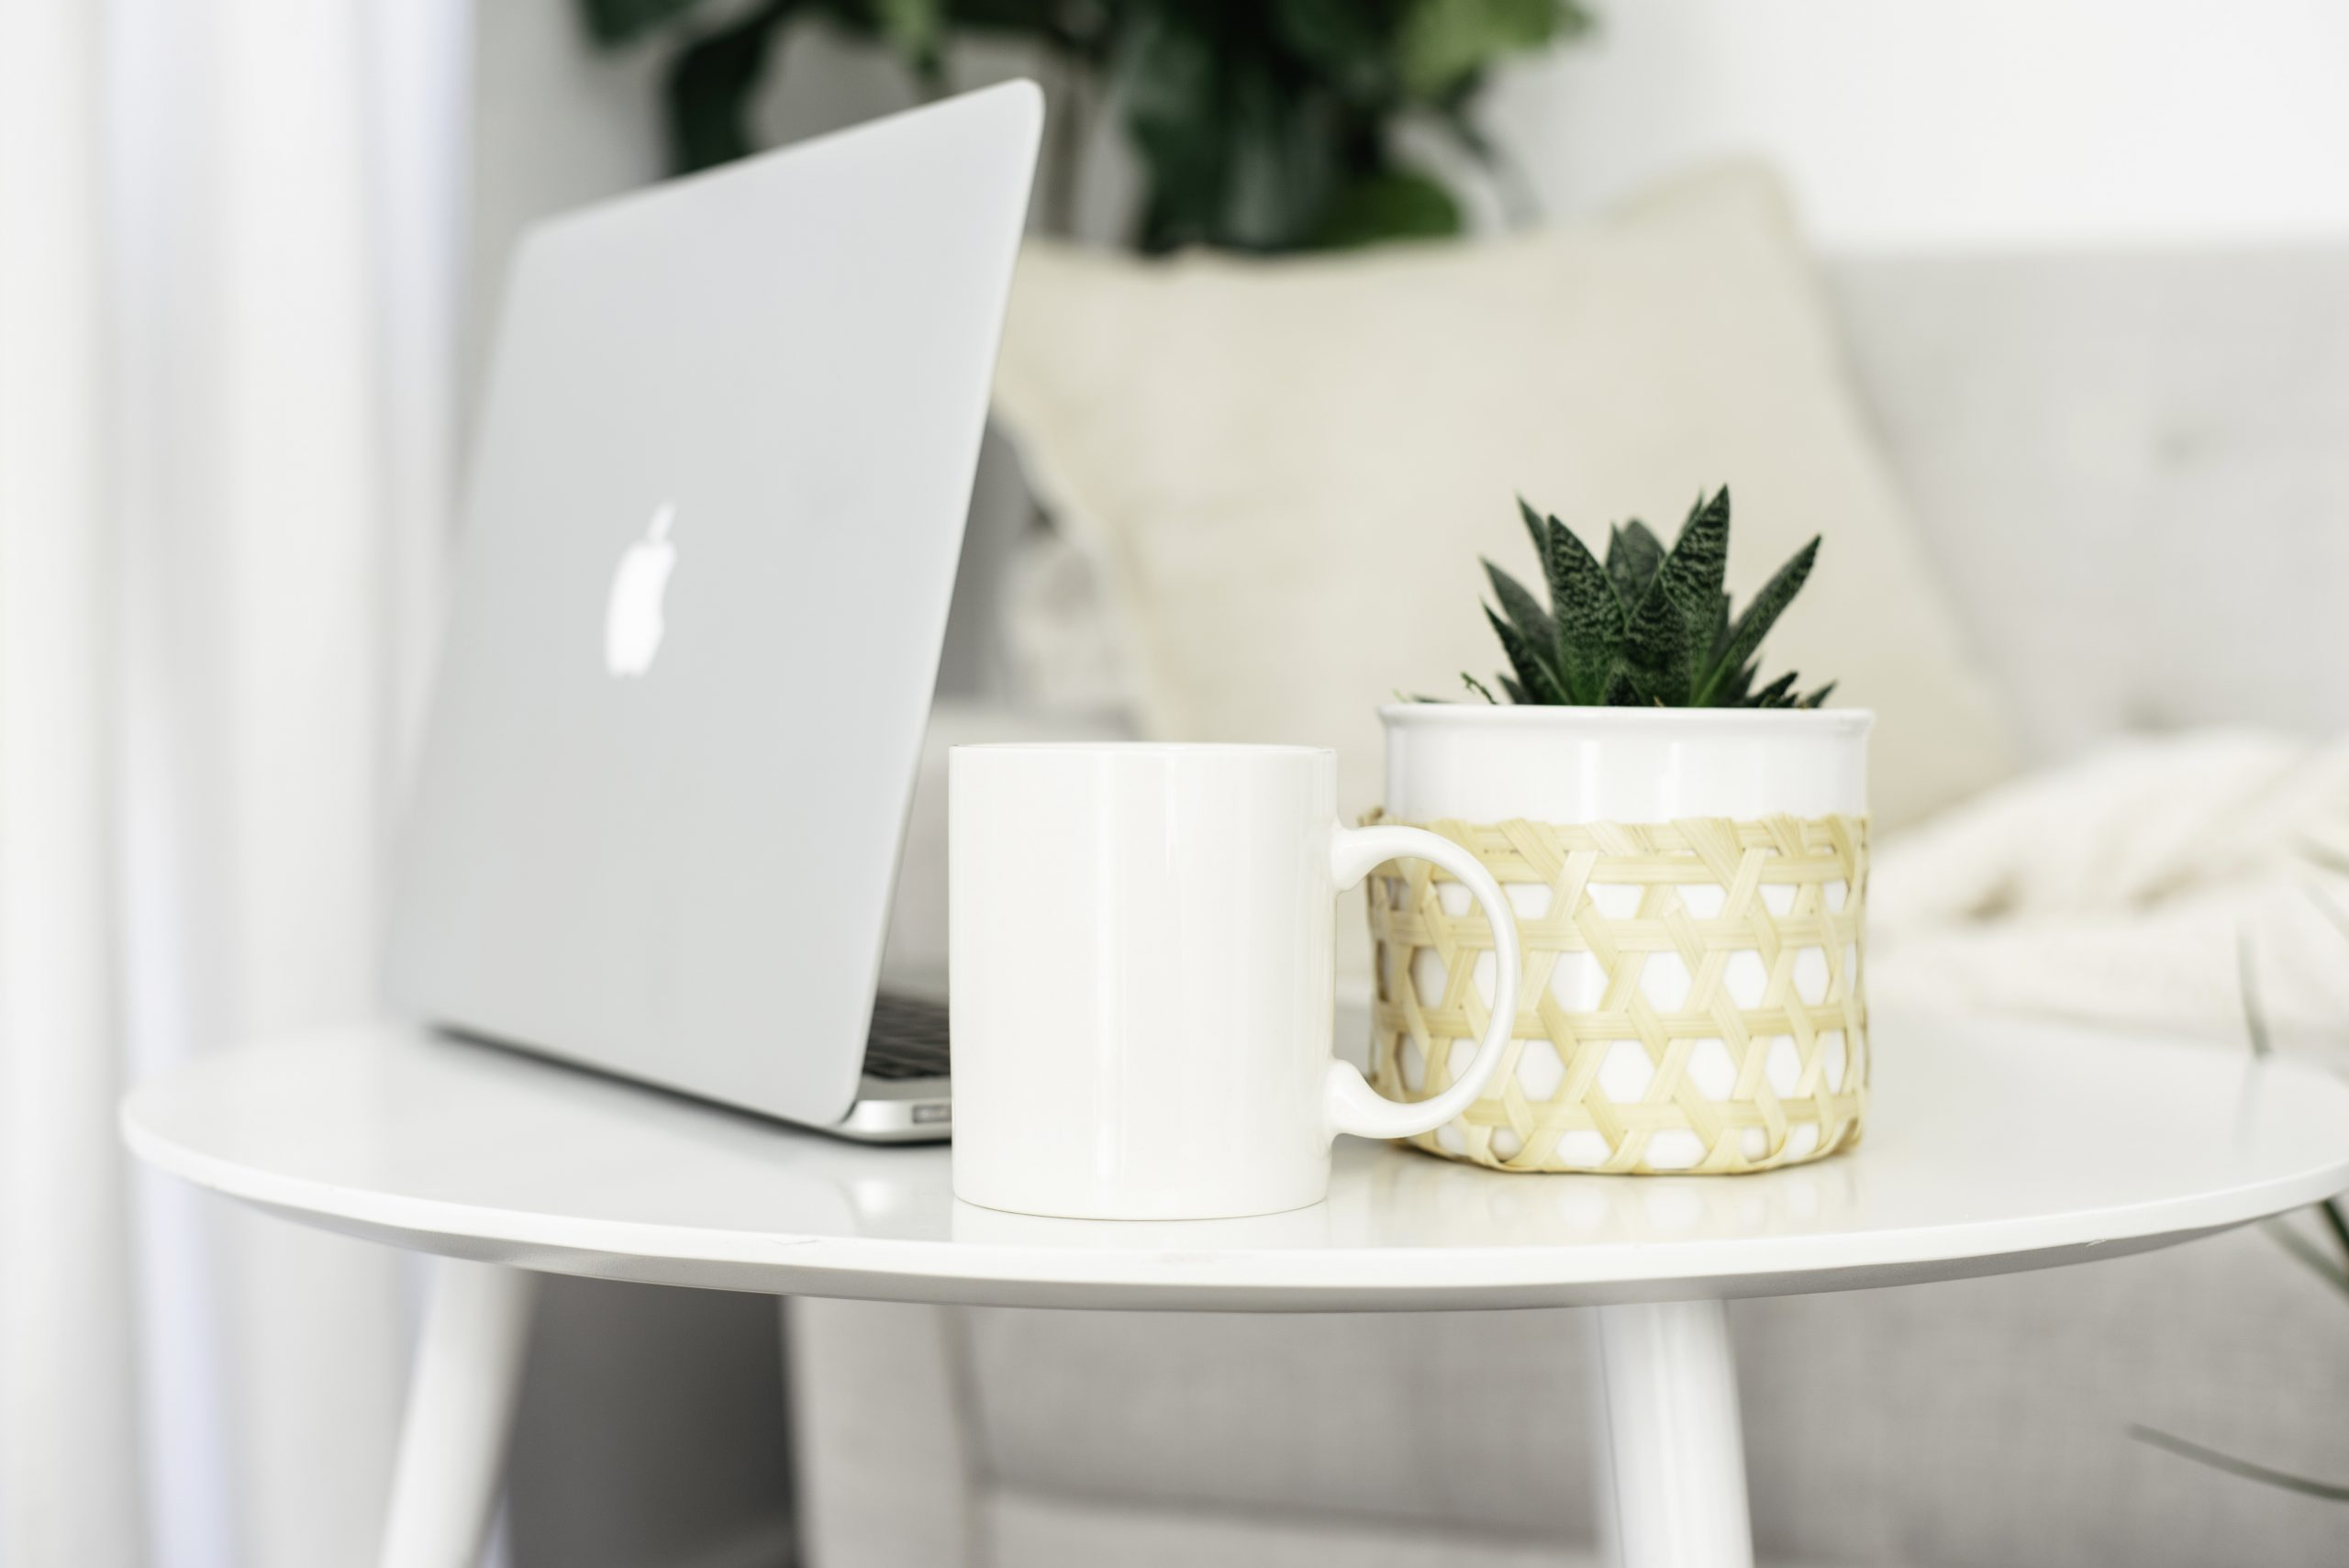 Paid online focus groups